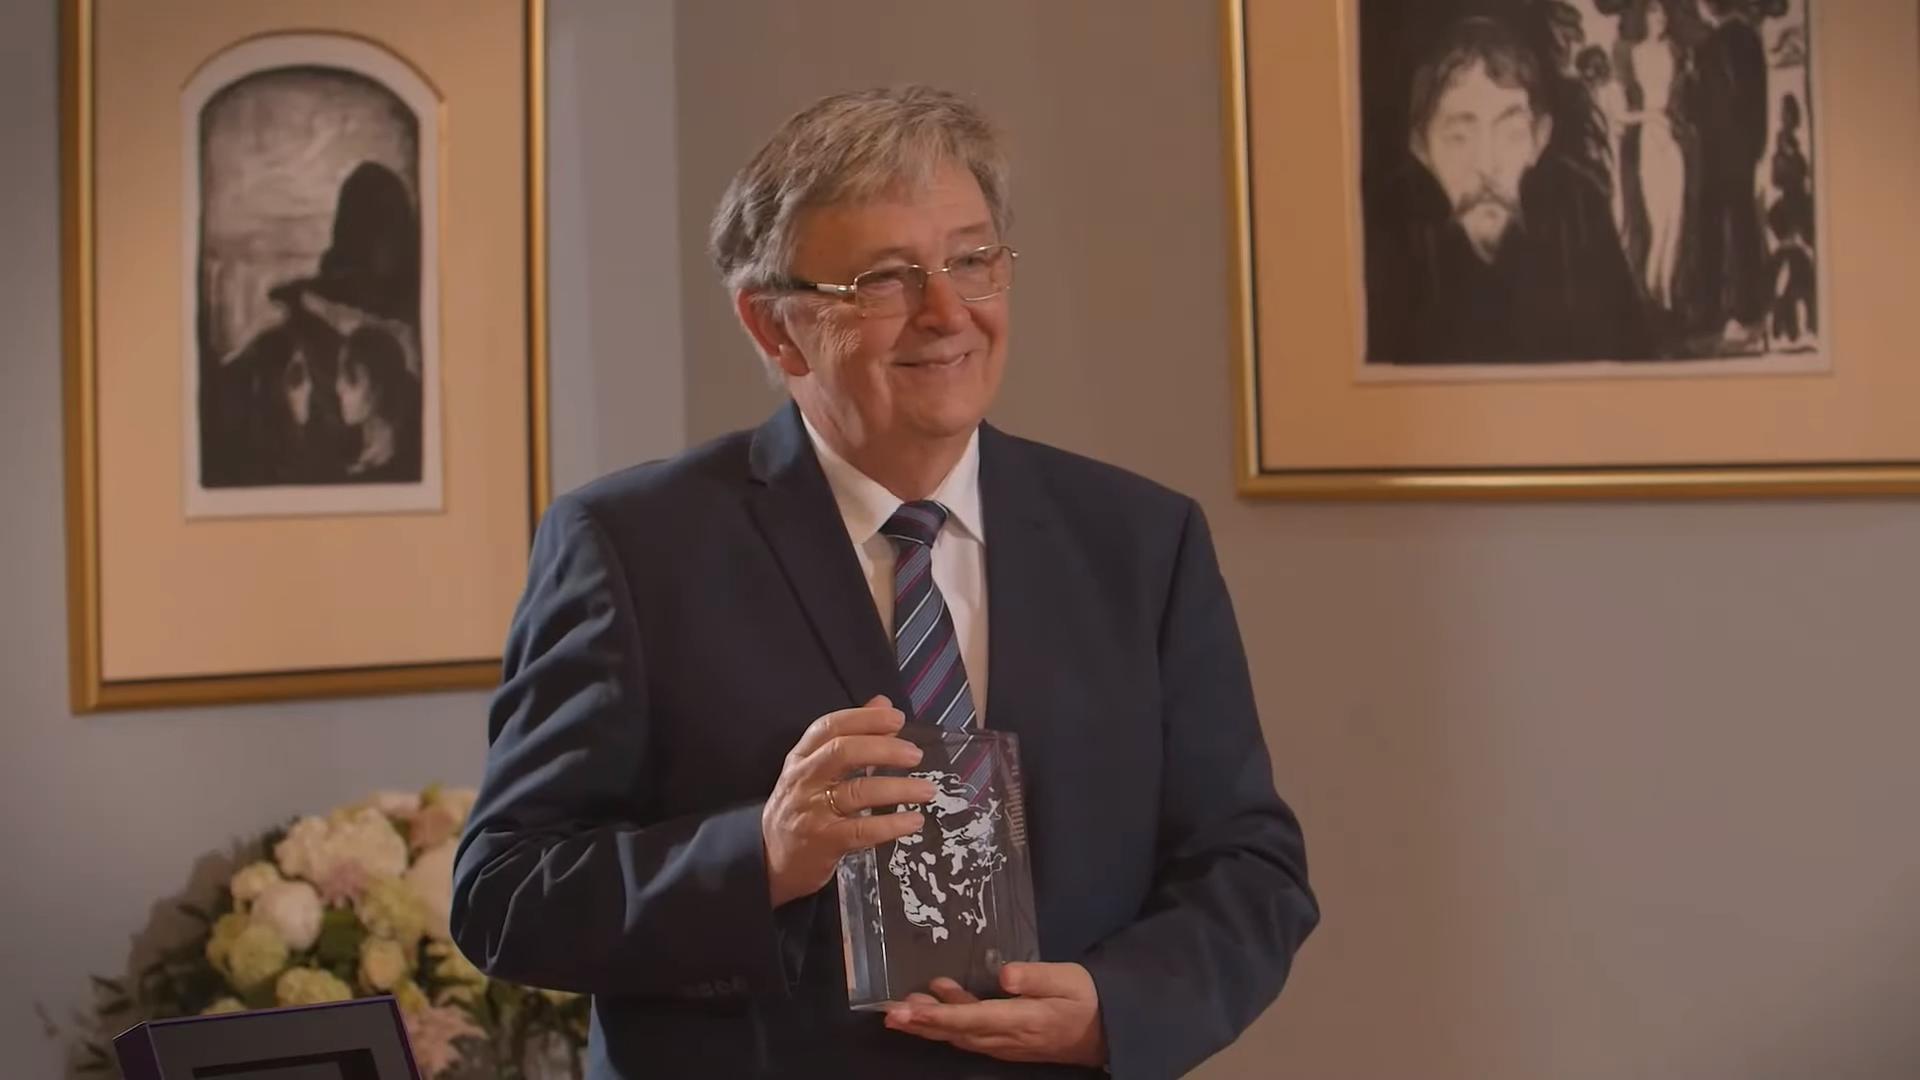 Abel Award Presented to László Lovász for Pioneering Computer Science